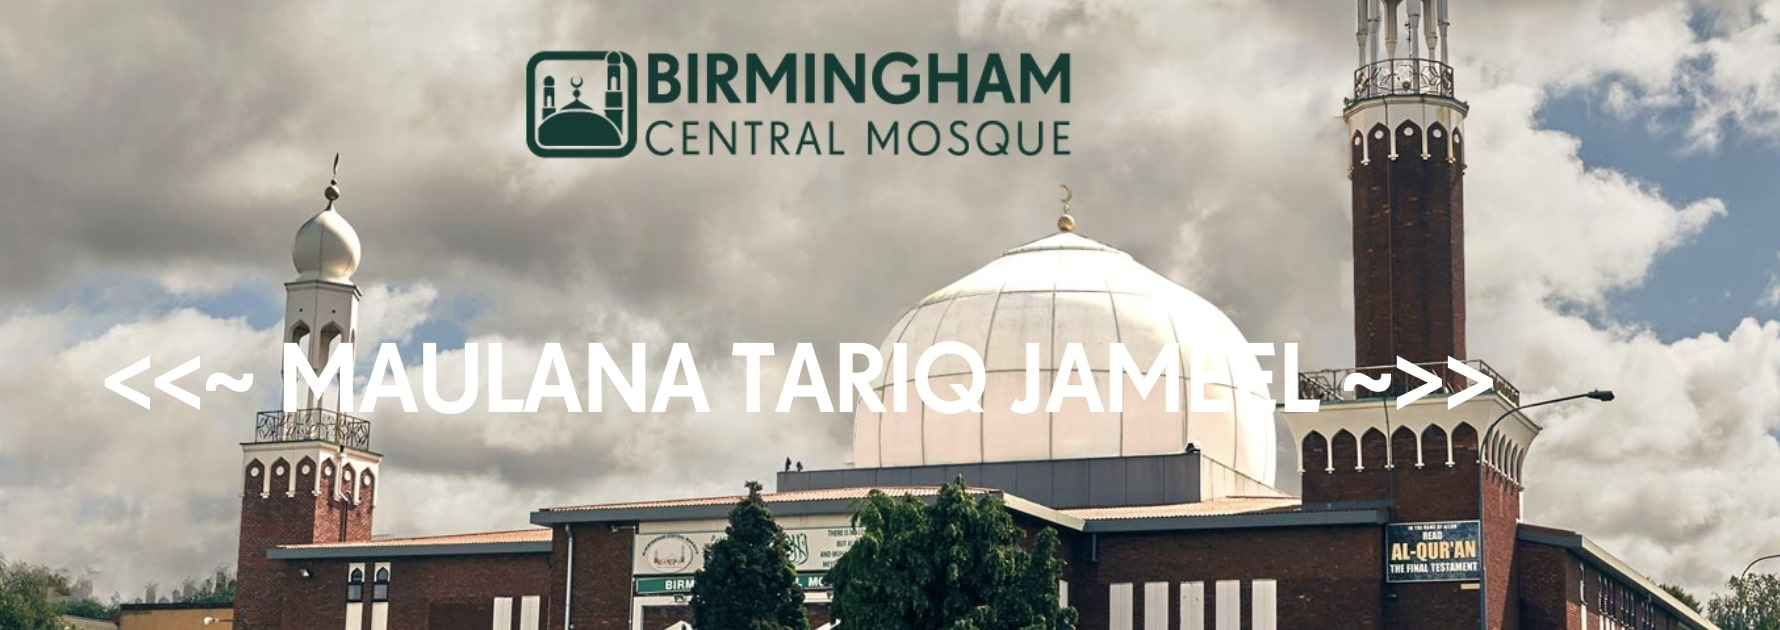 Molana Tariq Jamil - Birmingham